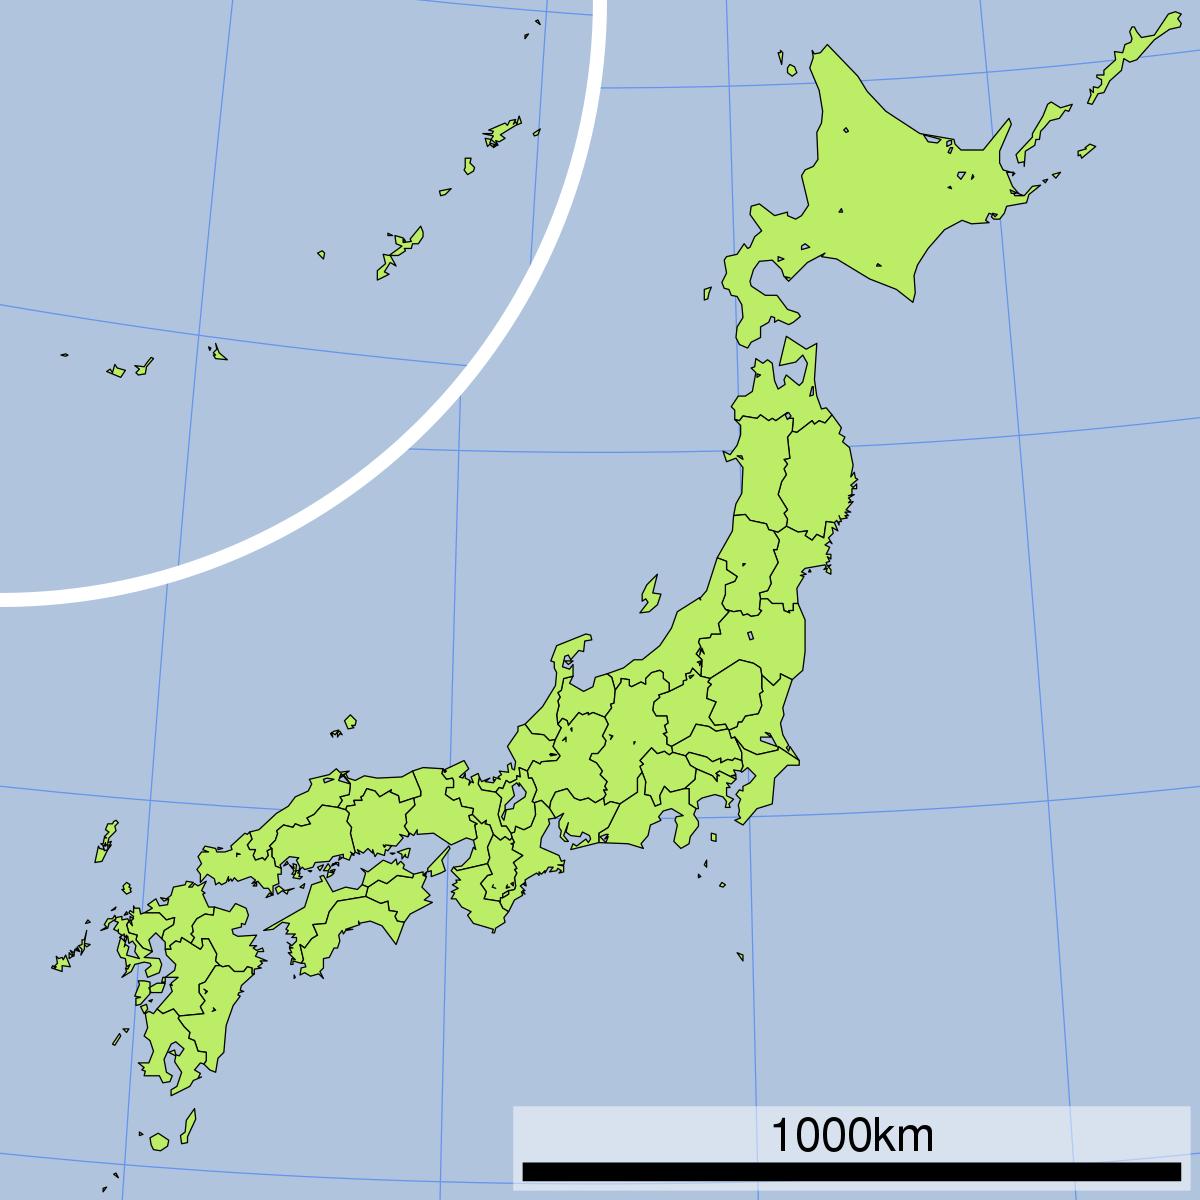 佐多岬 - Wikipedia